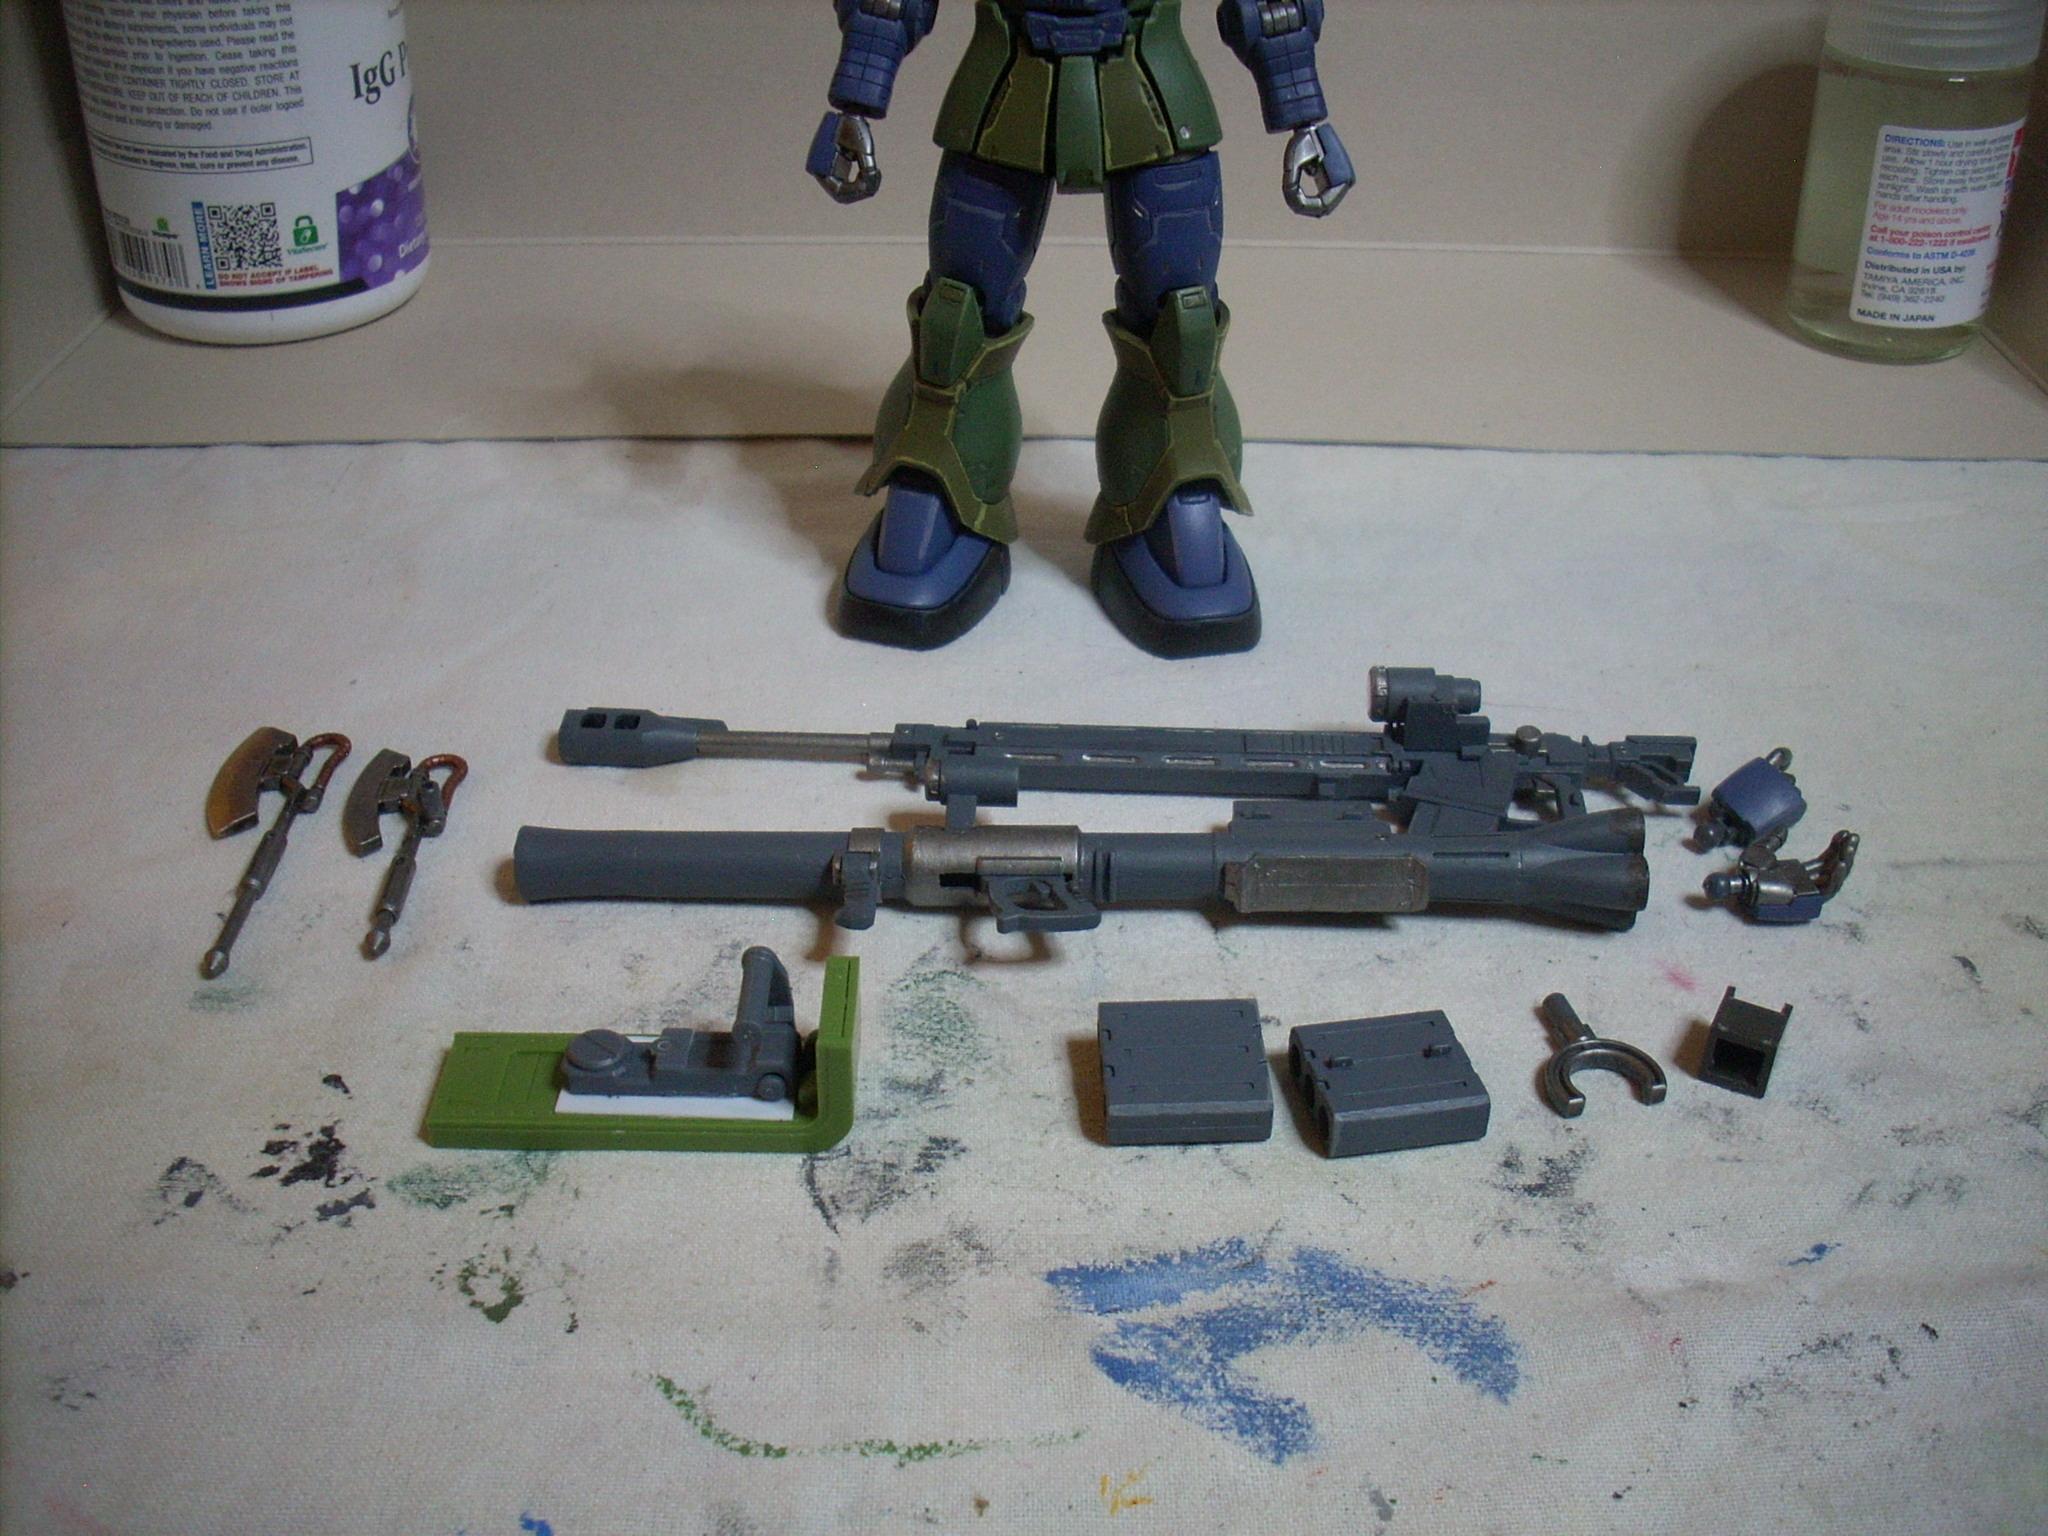 Gundam, Hg, Hguc, Mobile Suit, Msg, Origin, Shadowsanddust, Zaku, Zaku I